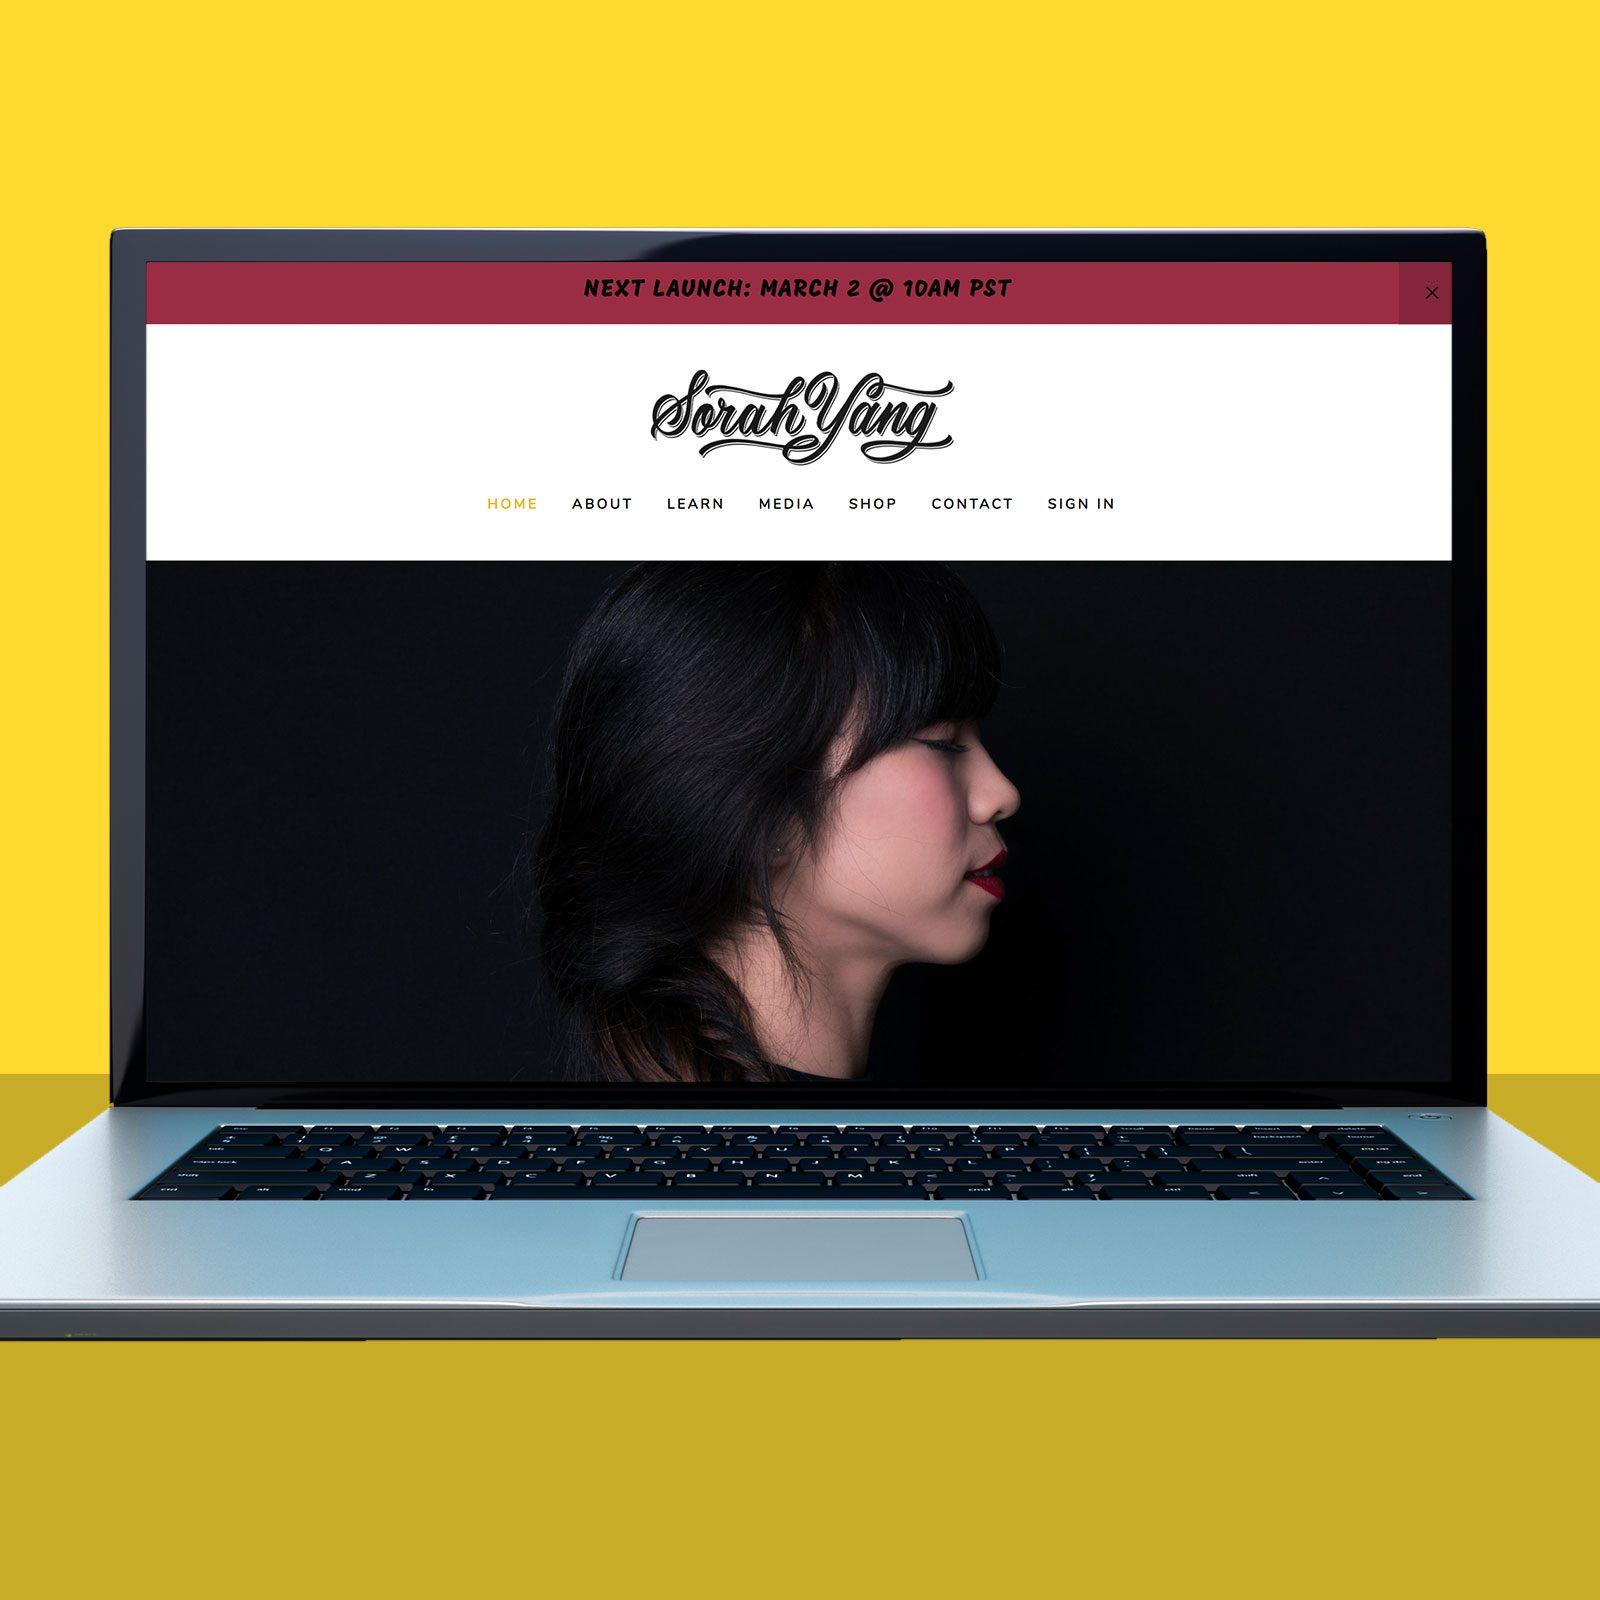 Sorahyang.com